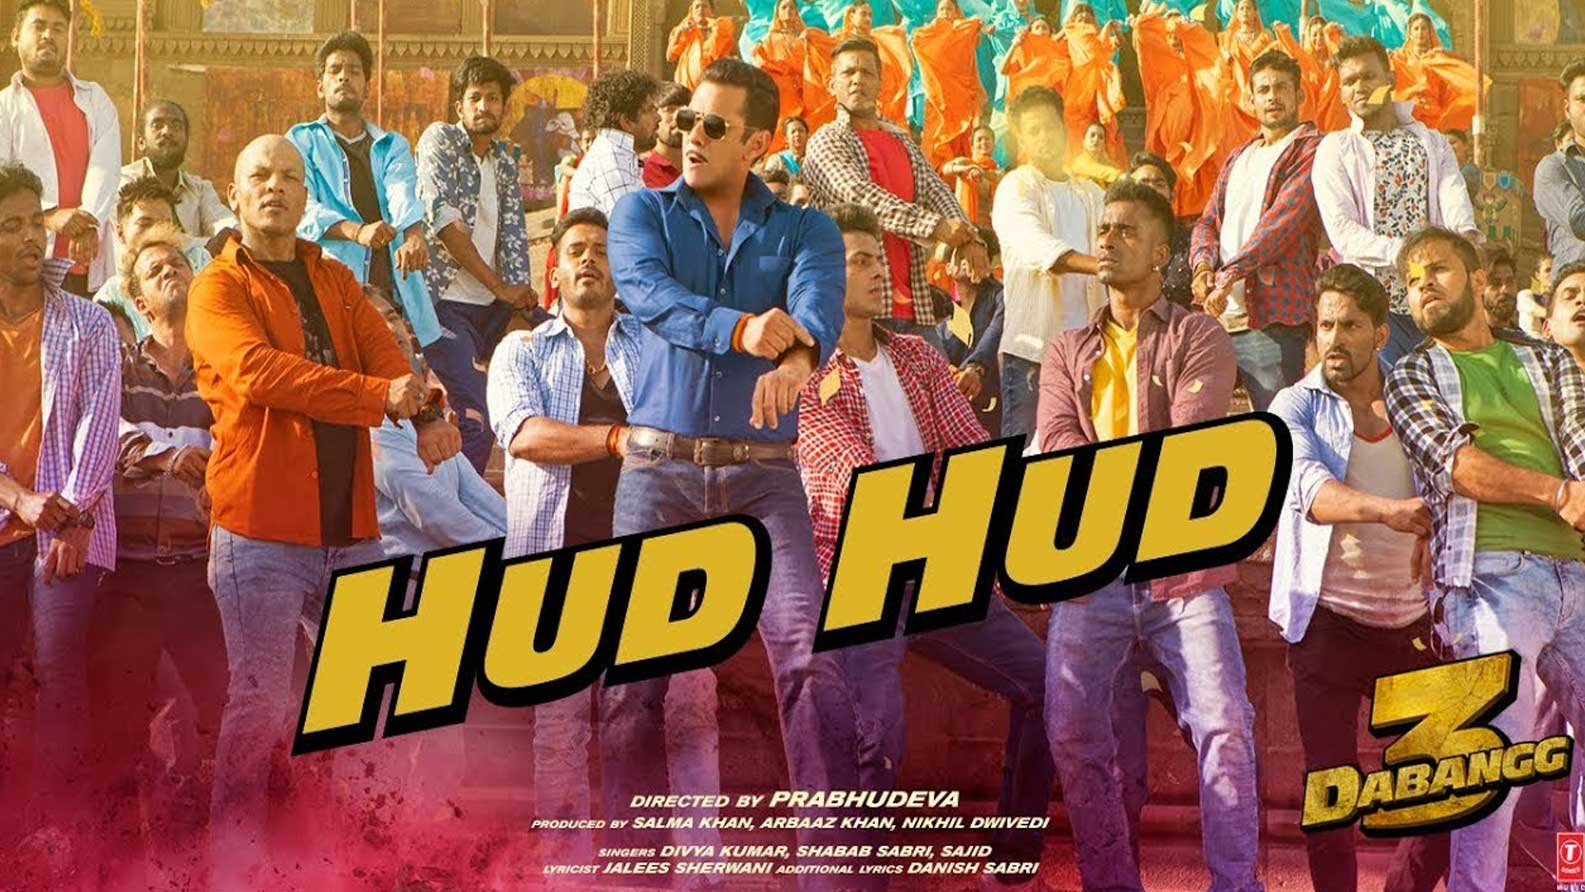 Sajid-Wajid talks about Salman Khan-starrer 'Dabangg 3' title song 'Hud Hud'